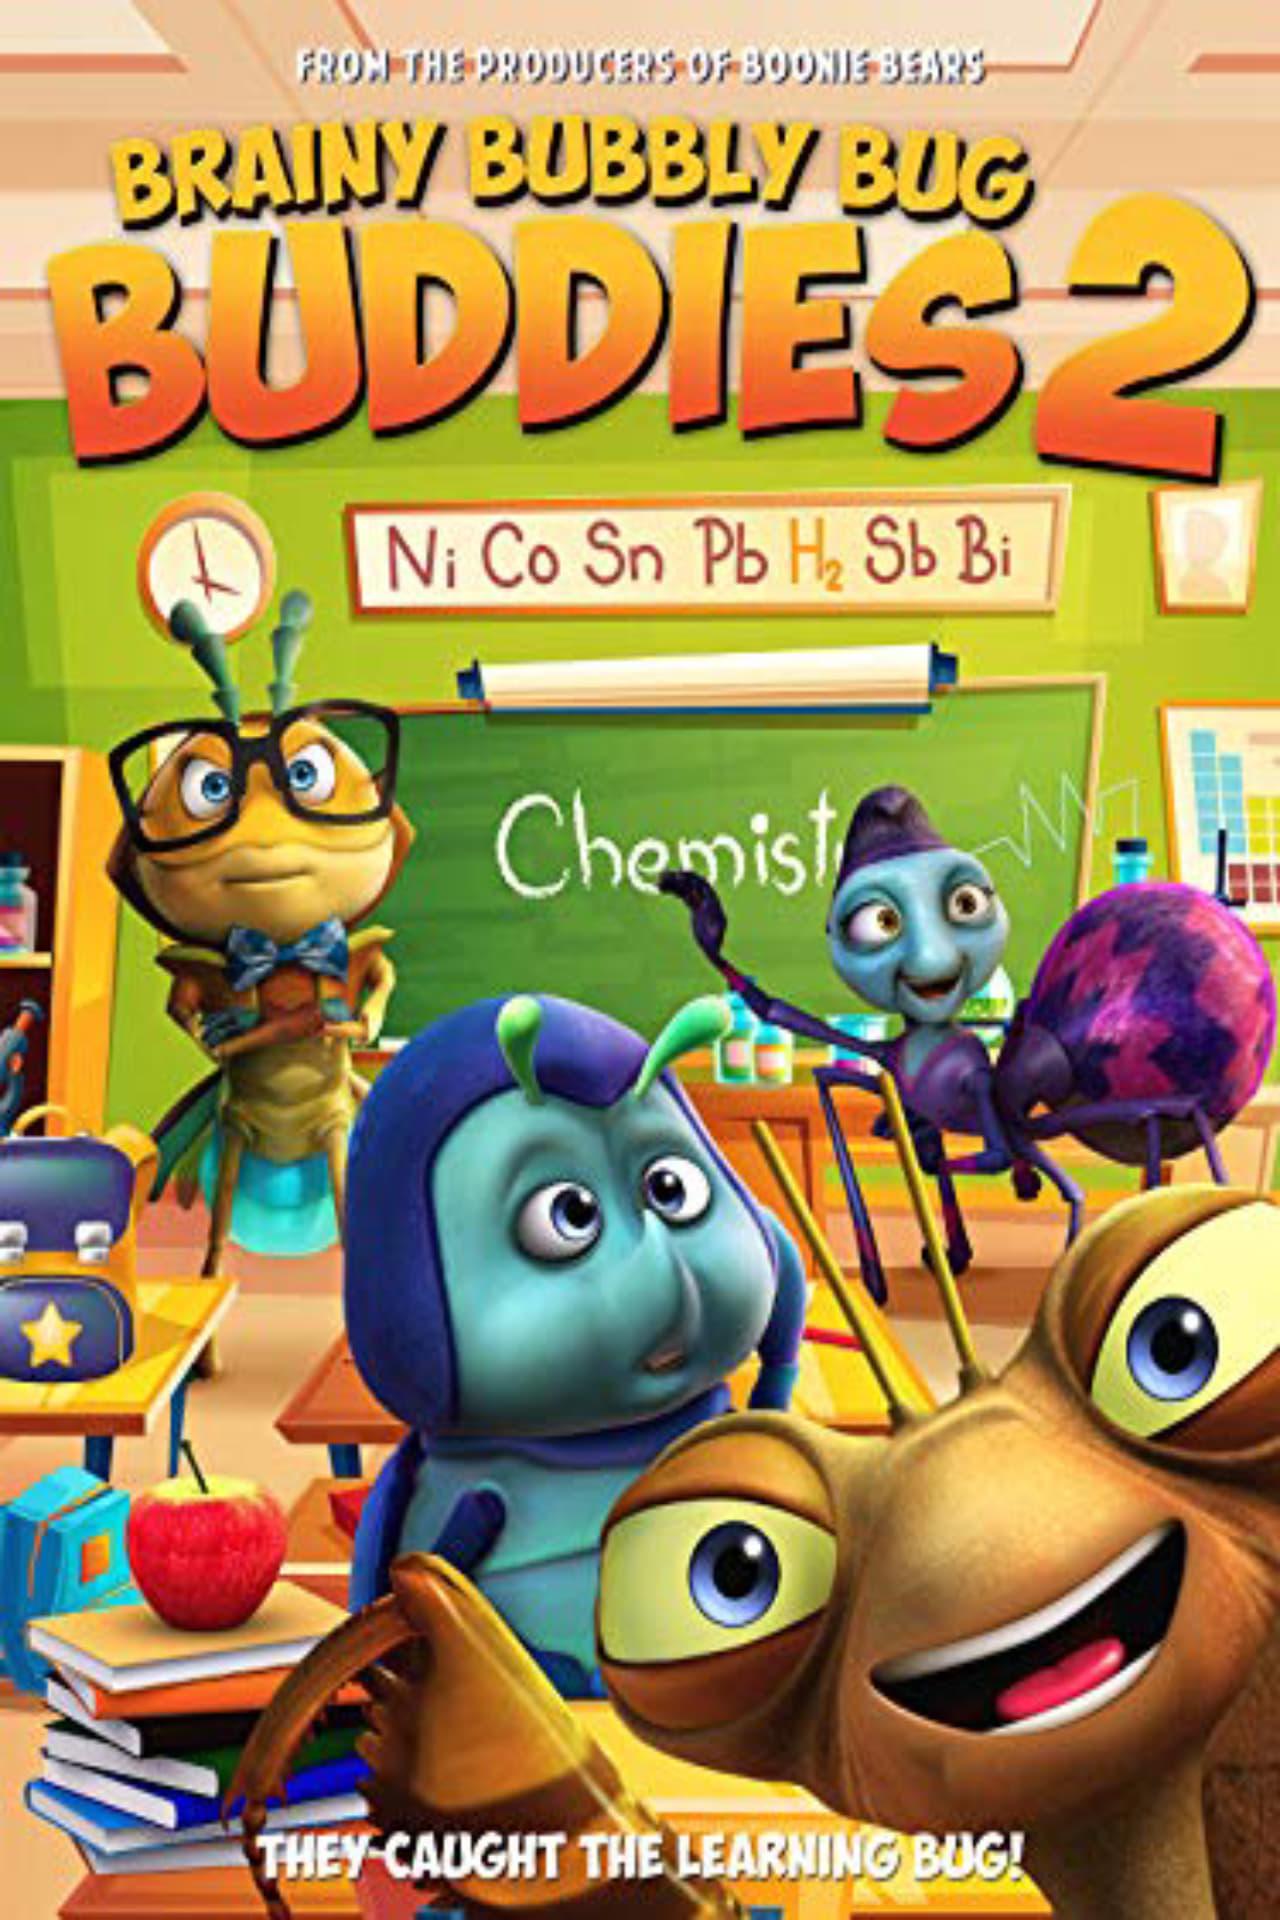 Brainy Bubbly Bug Buddies 2 on FREECABLE TV